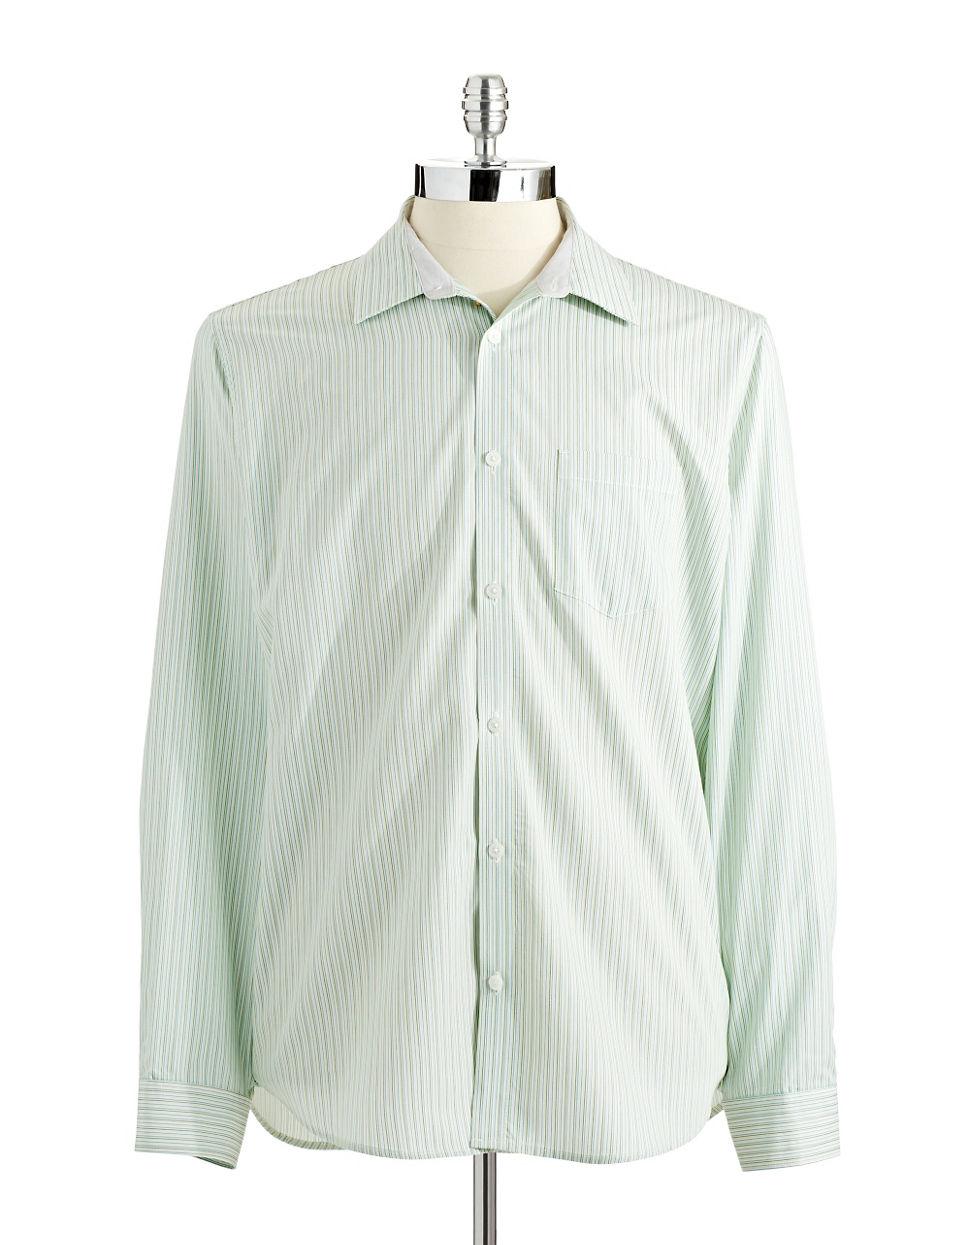 Calvin klein striped button down shirt in blue for men lyst for Striped button down shirts for men